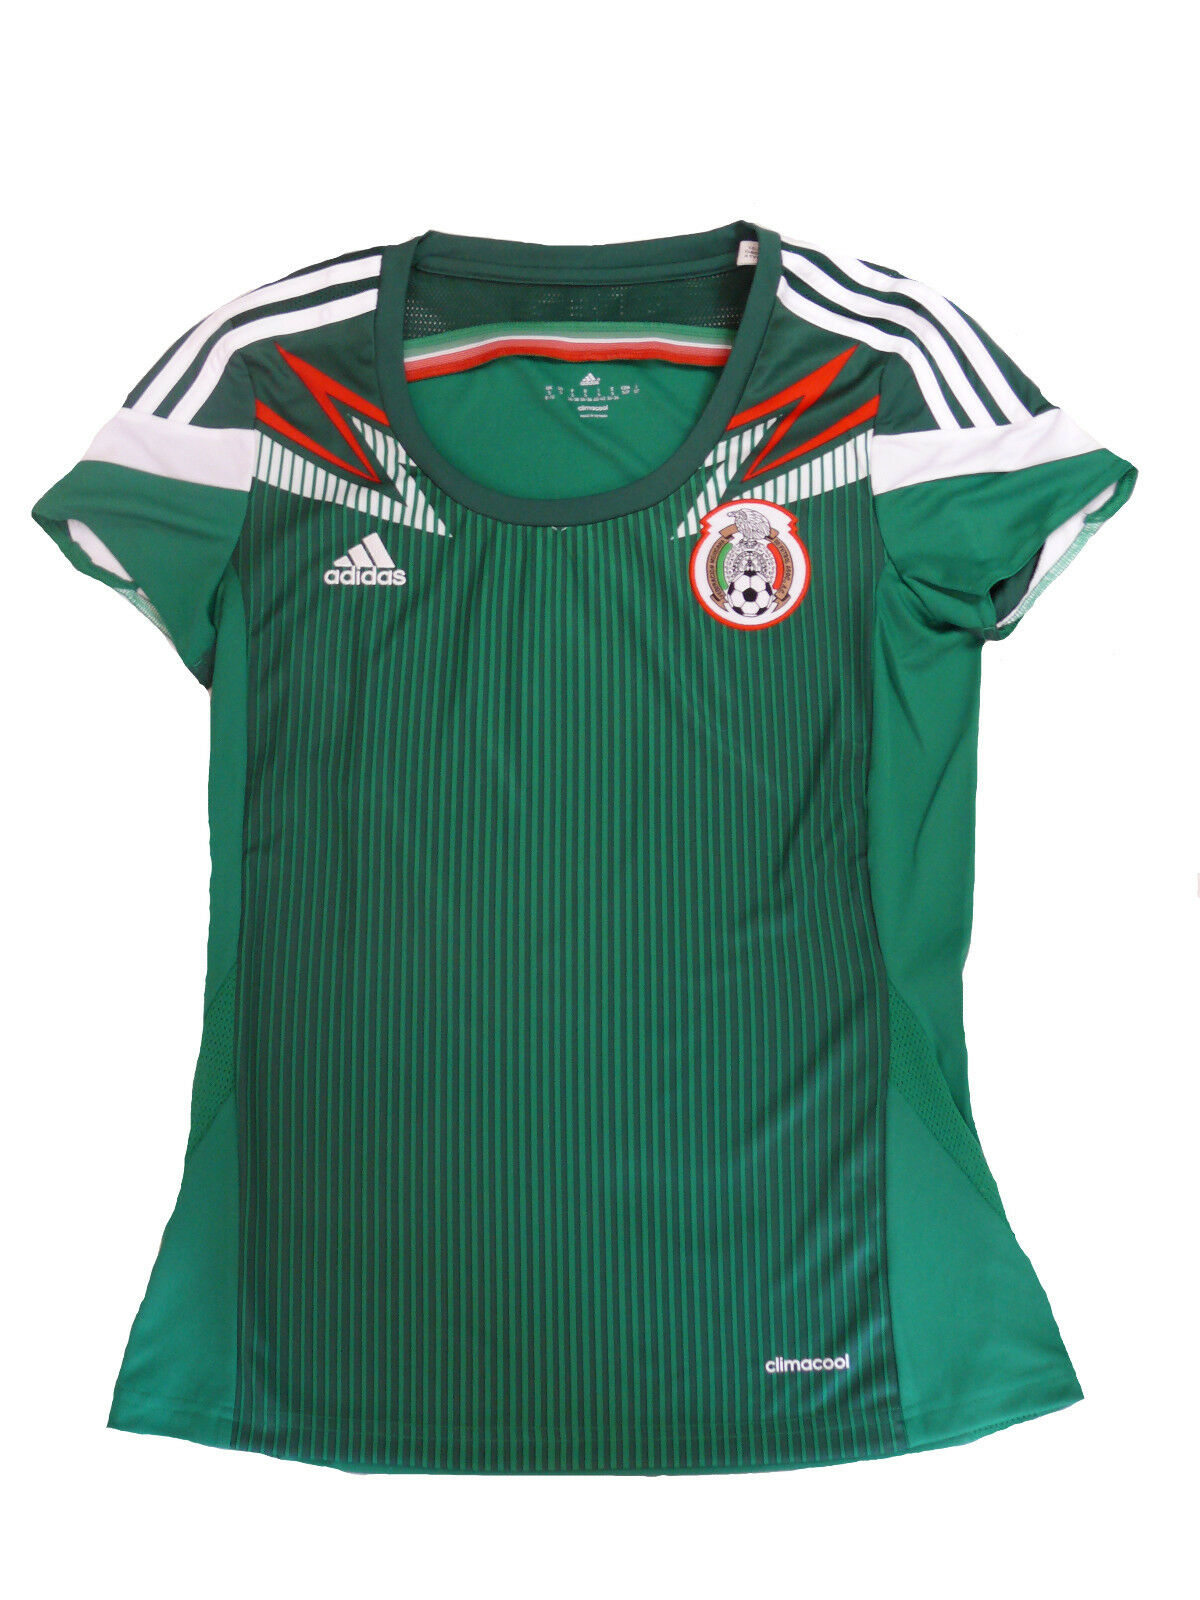 Adidas Mujer México Jersey Verde TALLA S (36)